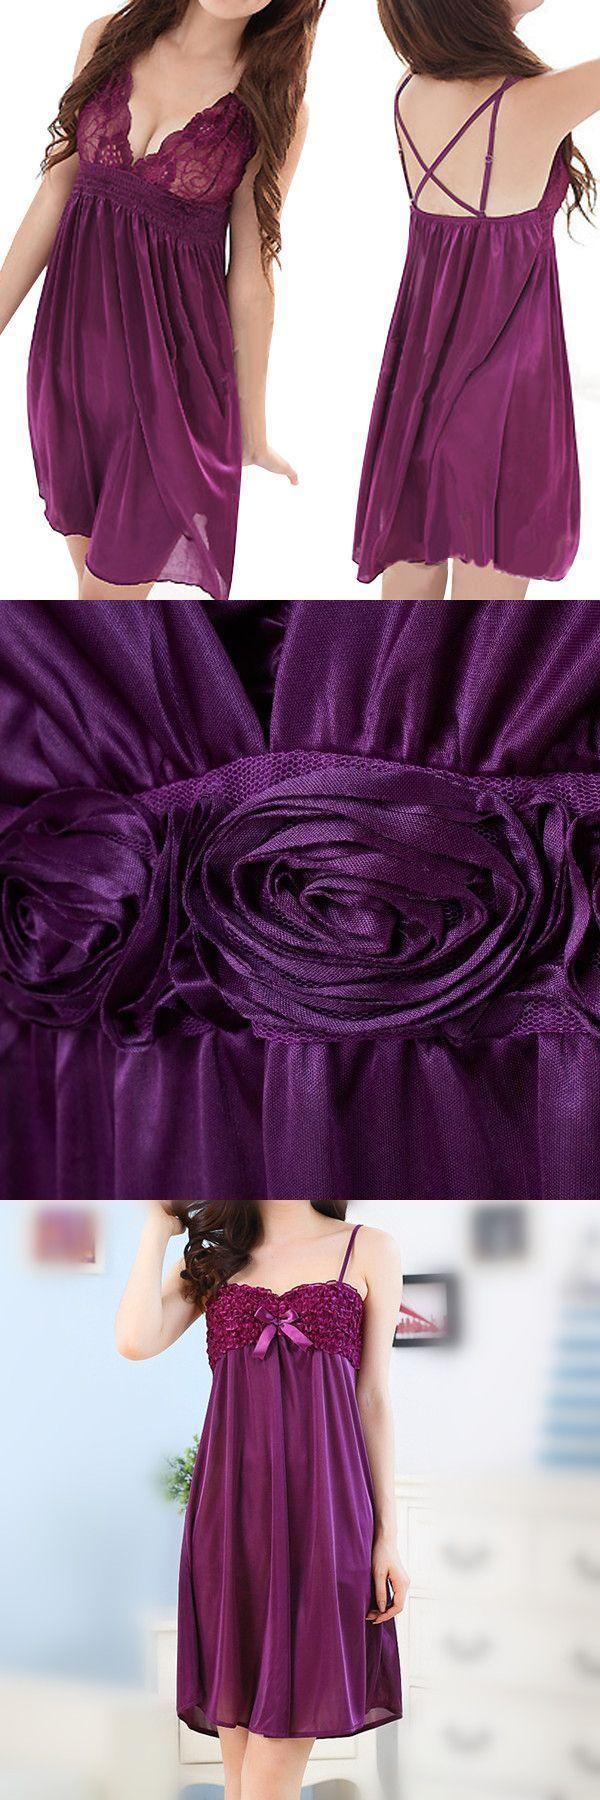 Plus size s-2xl sexy ice silk pajama sleeping dress lace temptation straps nightie cotton sleepwear robes #cheap #sleepwear #robes #mens #sleepwear #in #fashion #sleepwear #fashion #designers #sleepwear #in #fashion